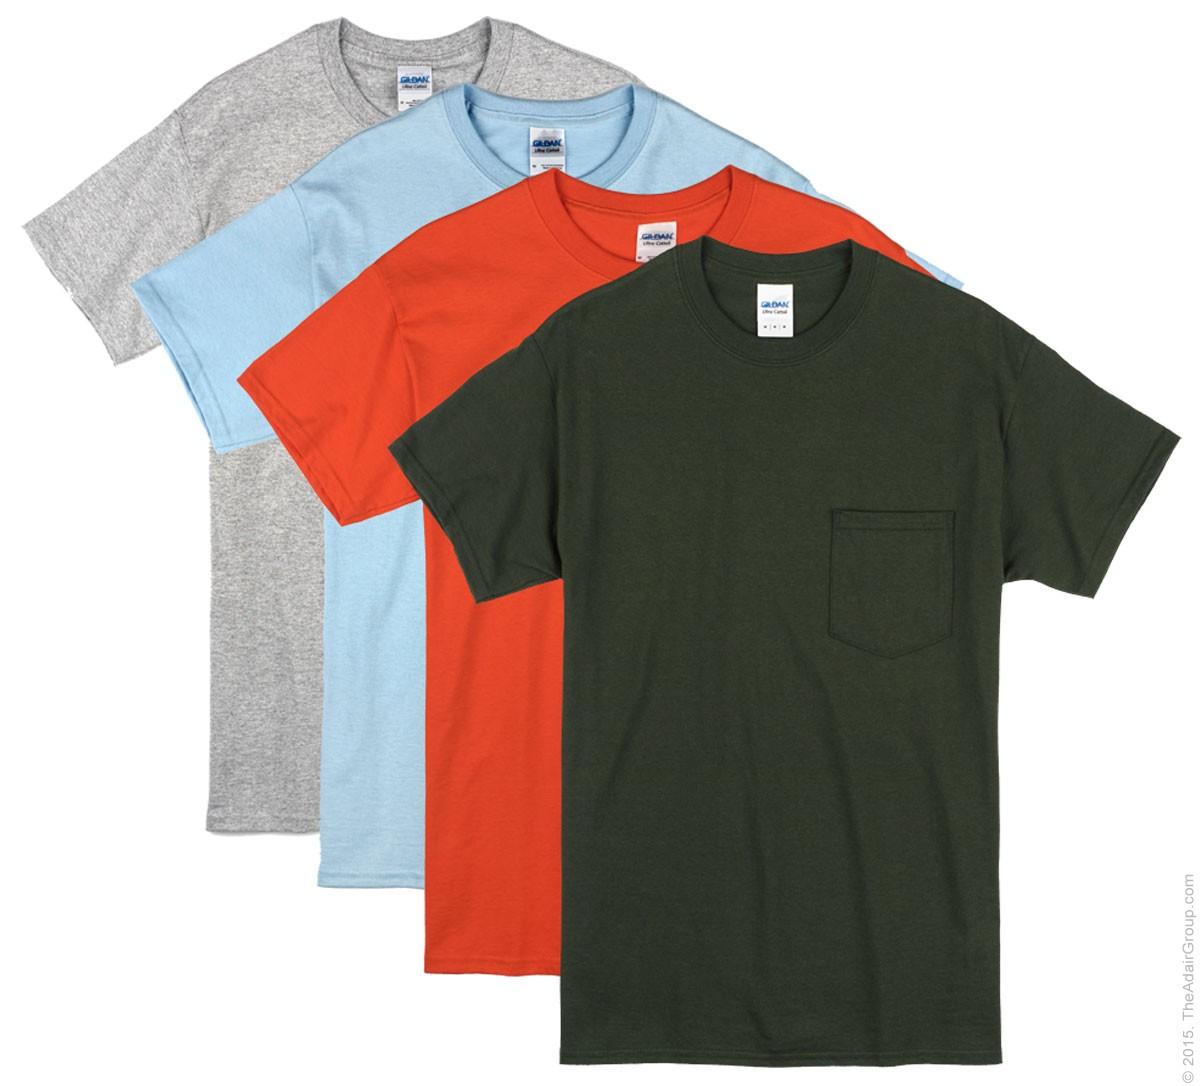 Pocket T Shirt T Shirt Design Collections